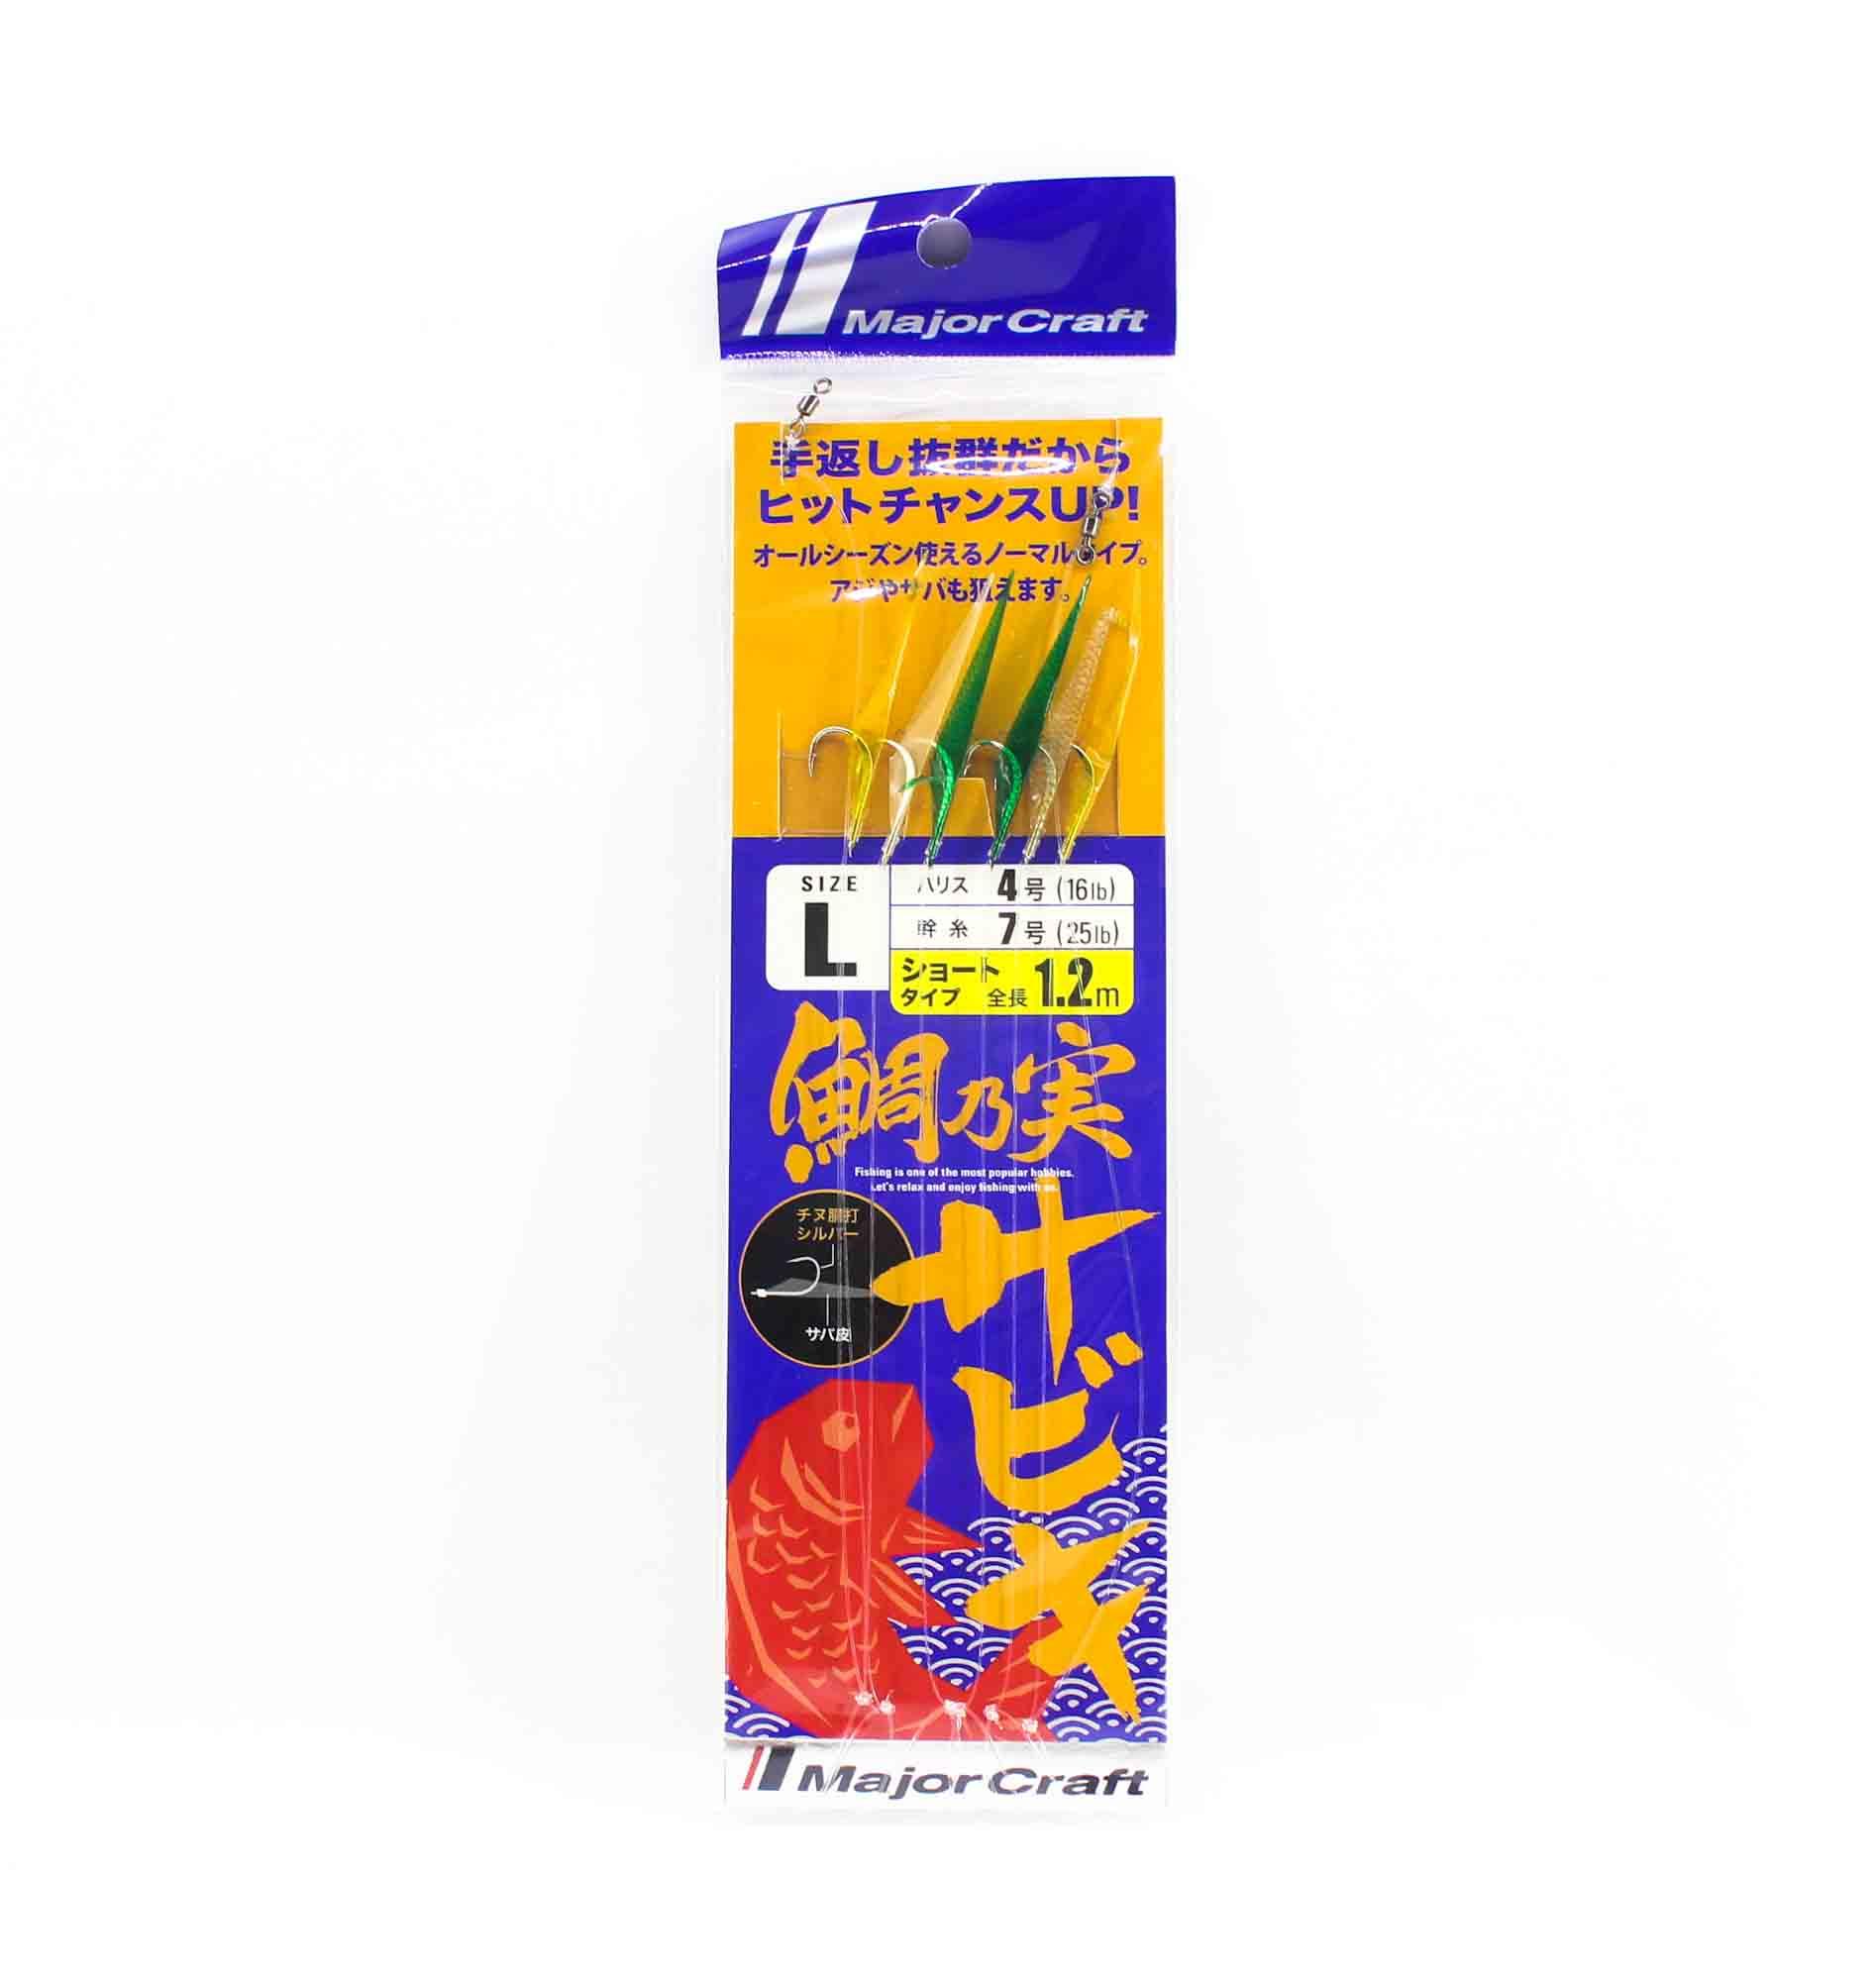 Major Craft TM-Sabiki 120/L Sabiki 120cm , Branch 16lb, Main 25lb (4435)